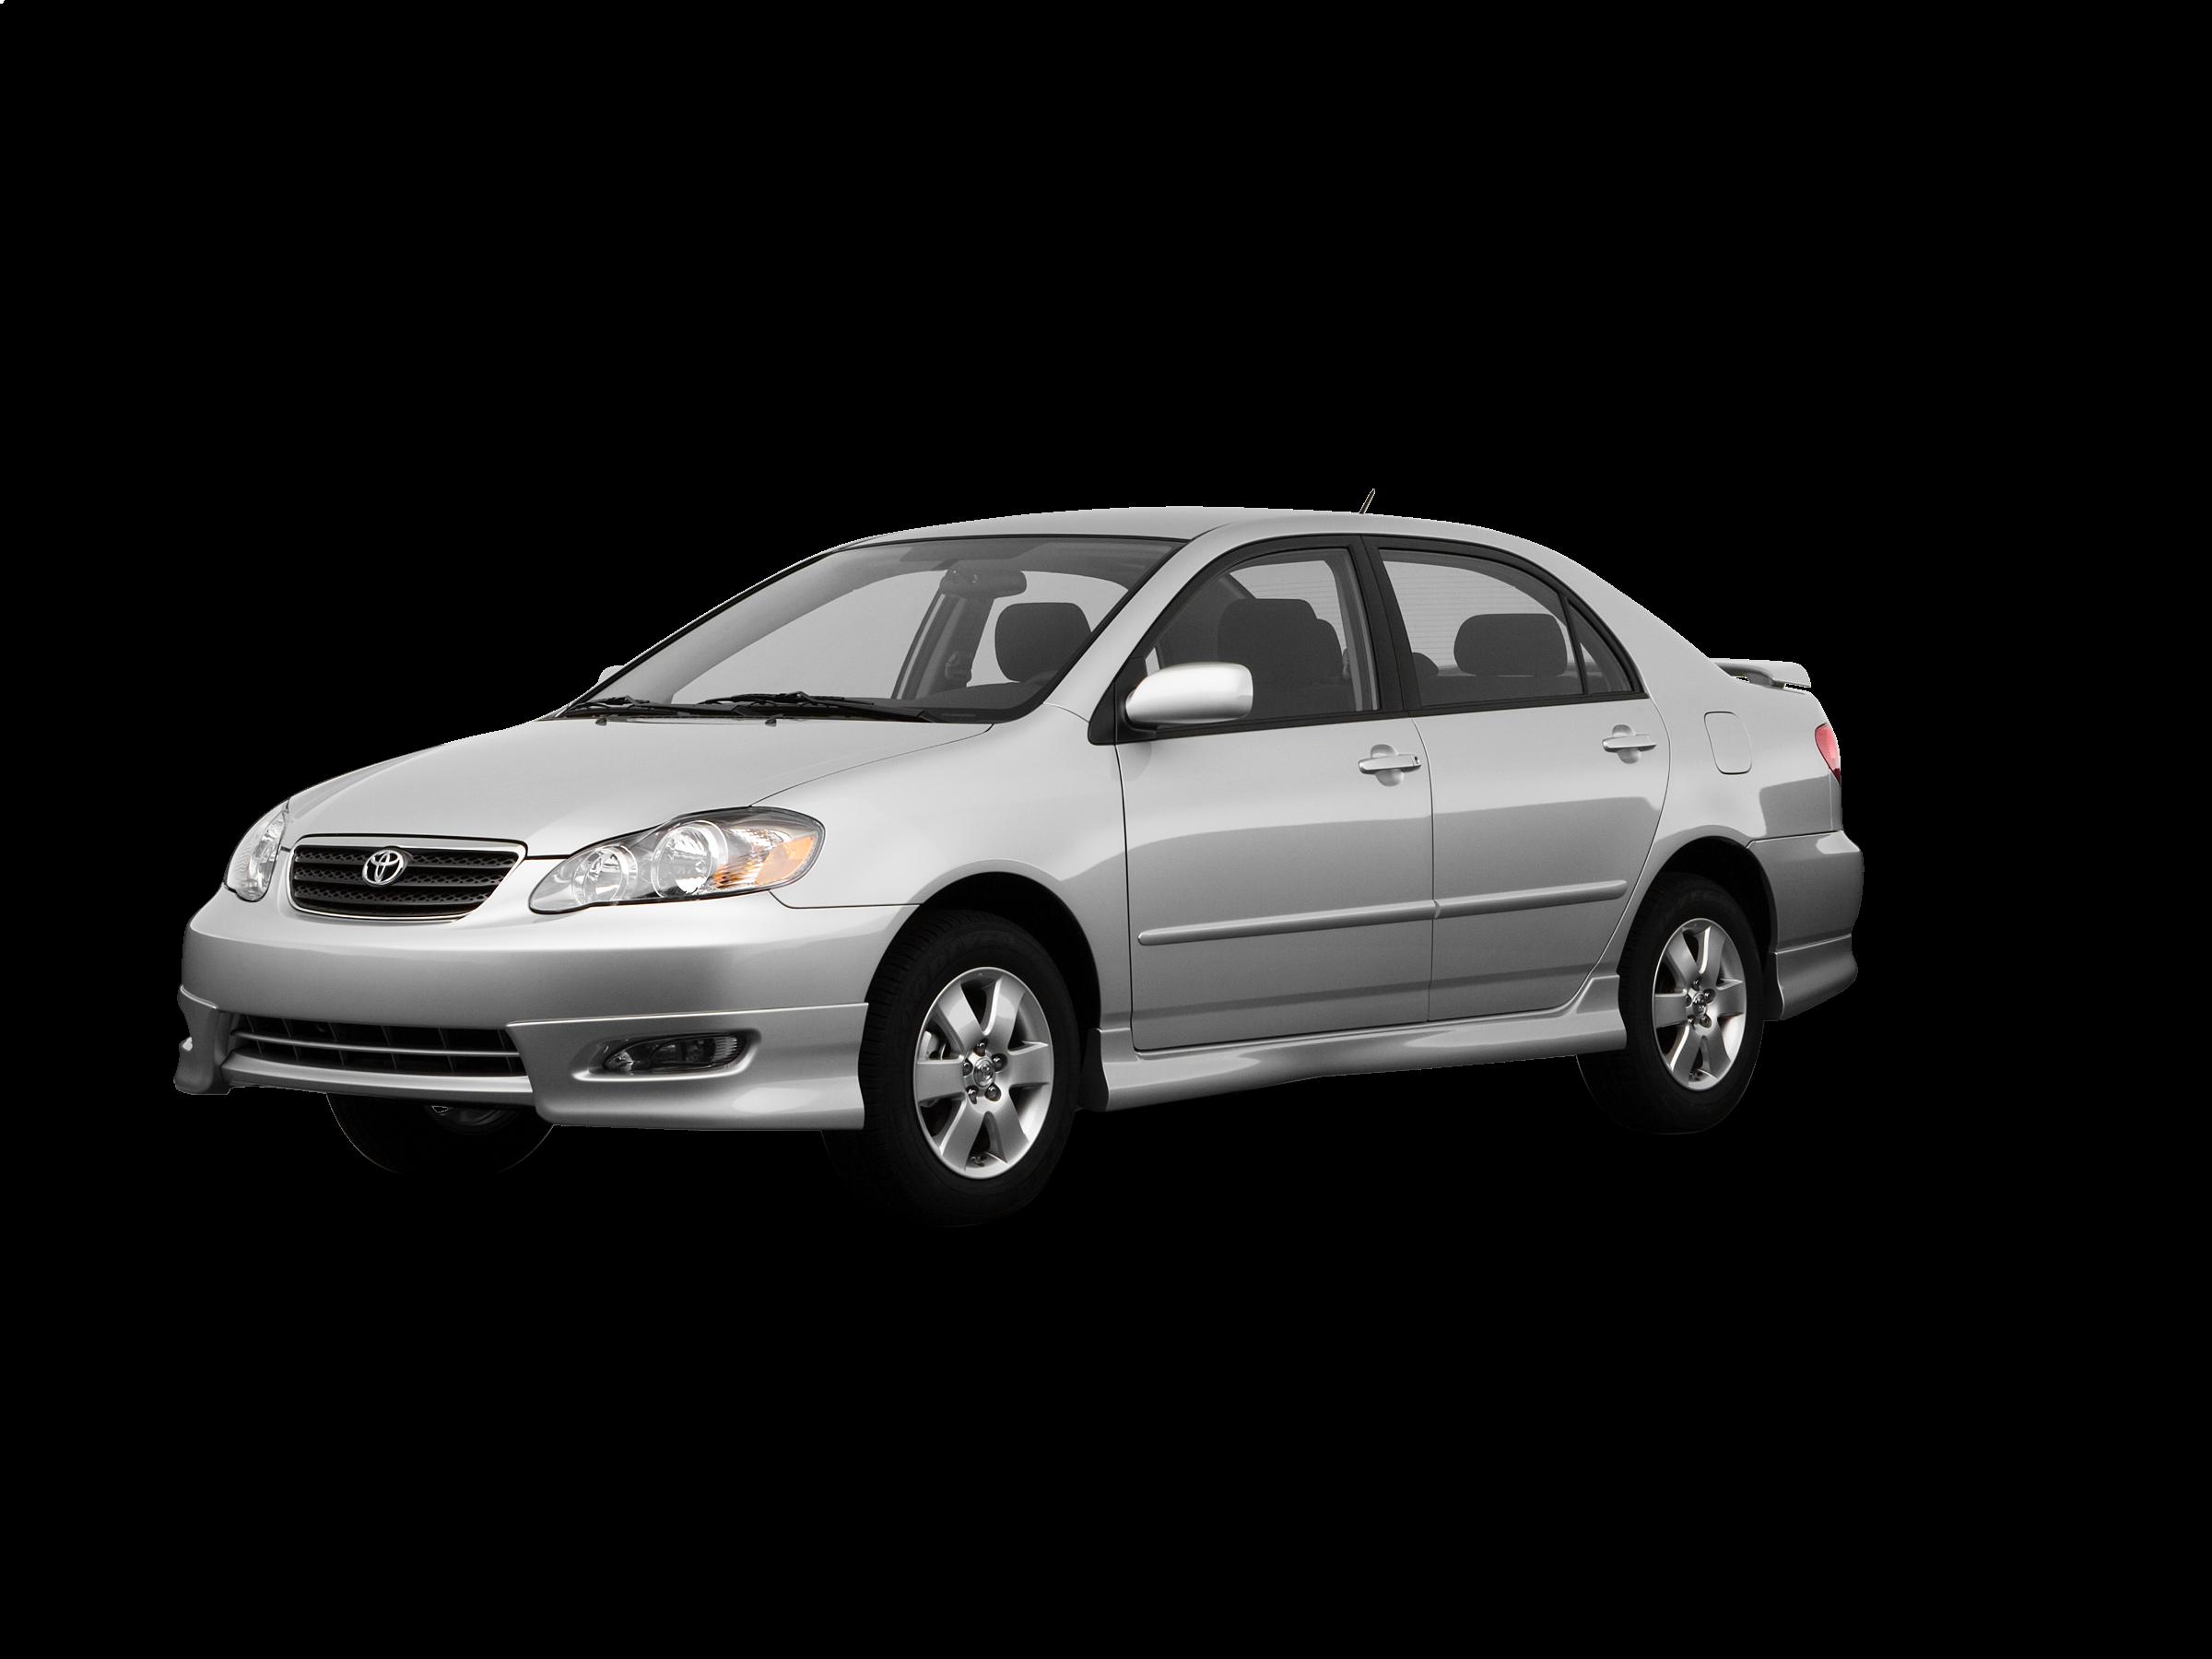 Kekurangan Toyota Corolla 2008 Spesifikasi